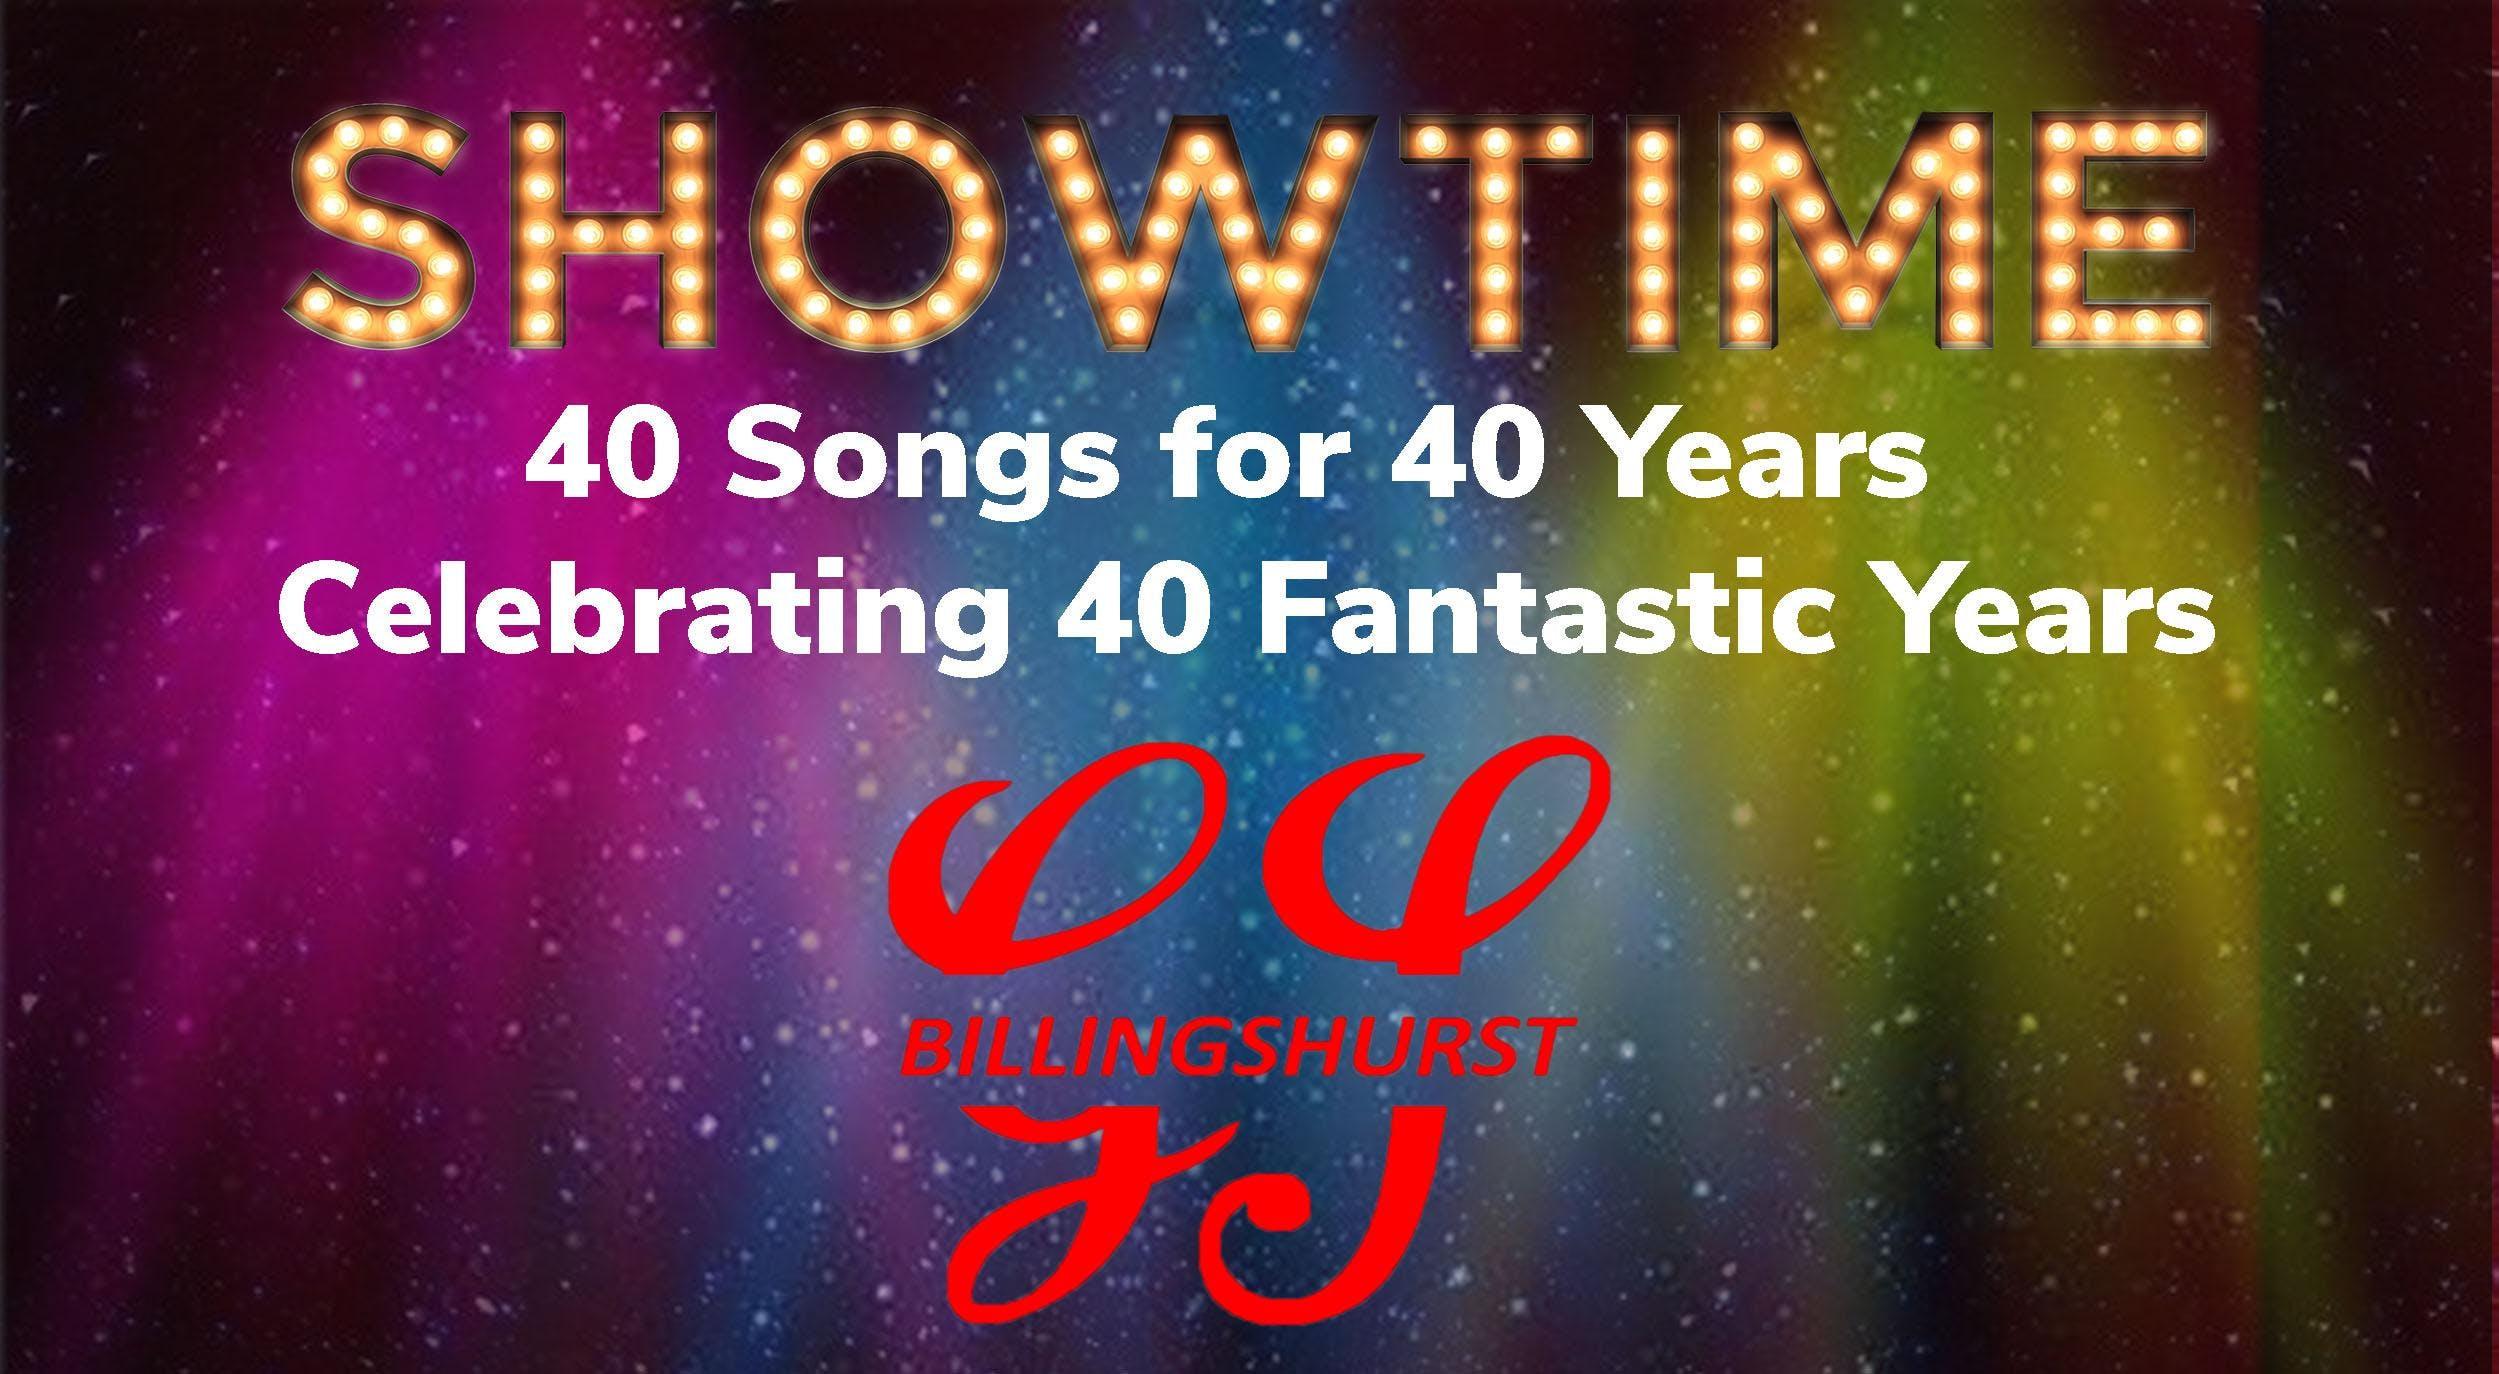 Showtime - Billingshurst Gang Show Saturday N